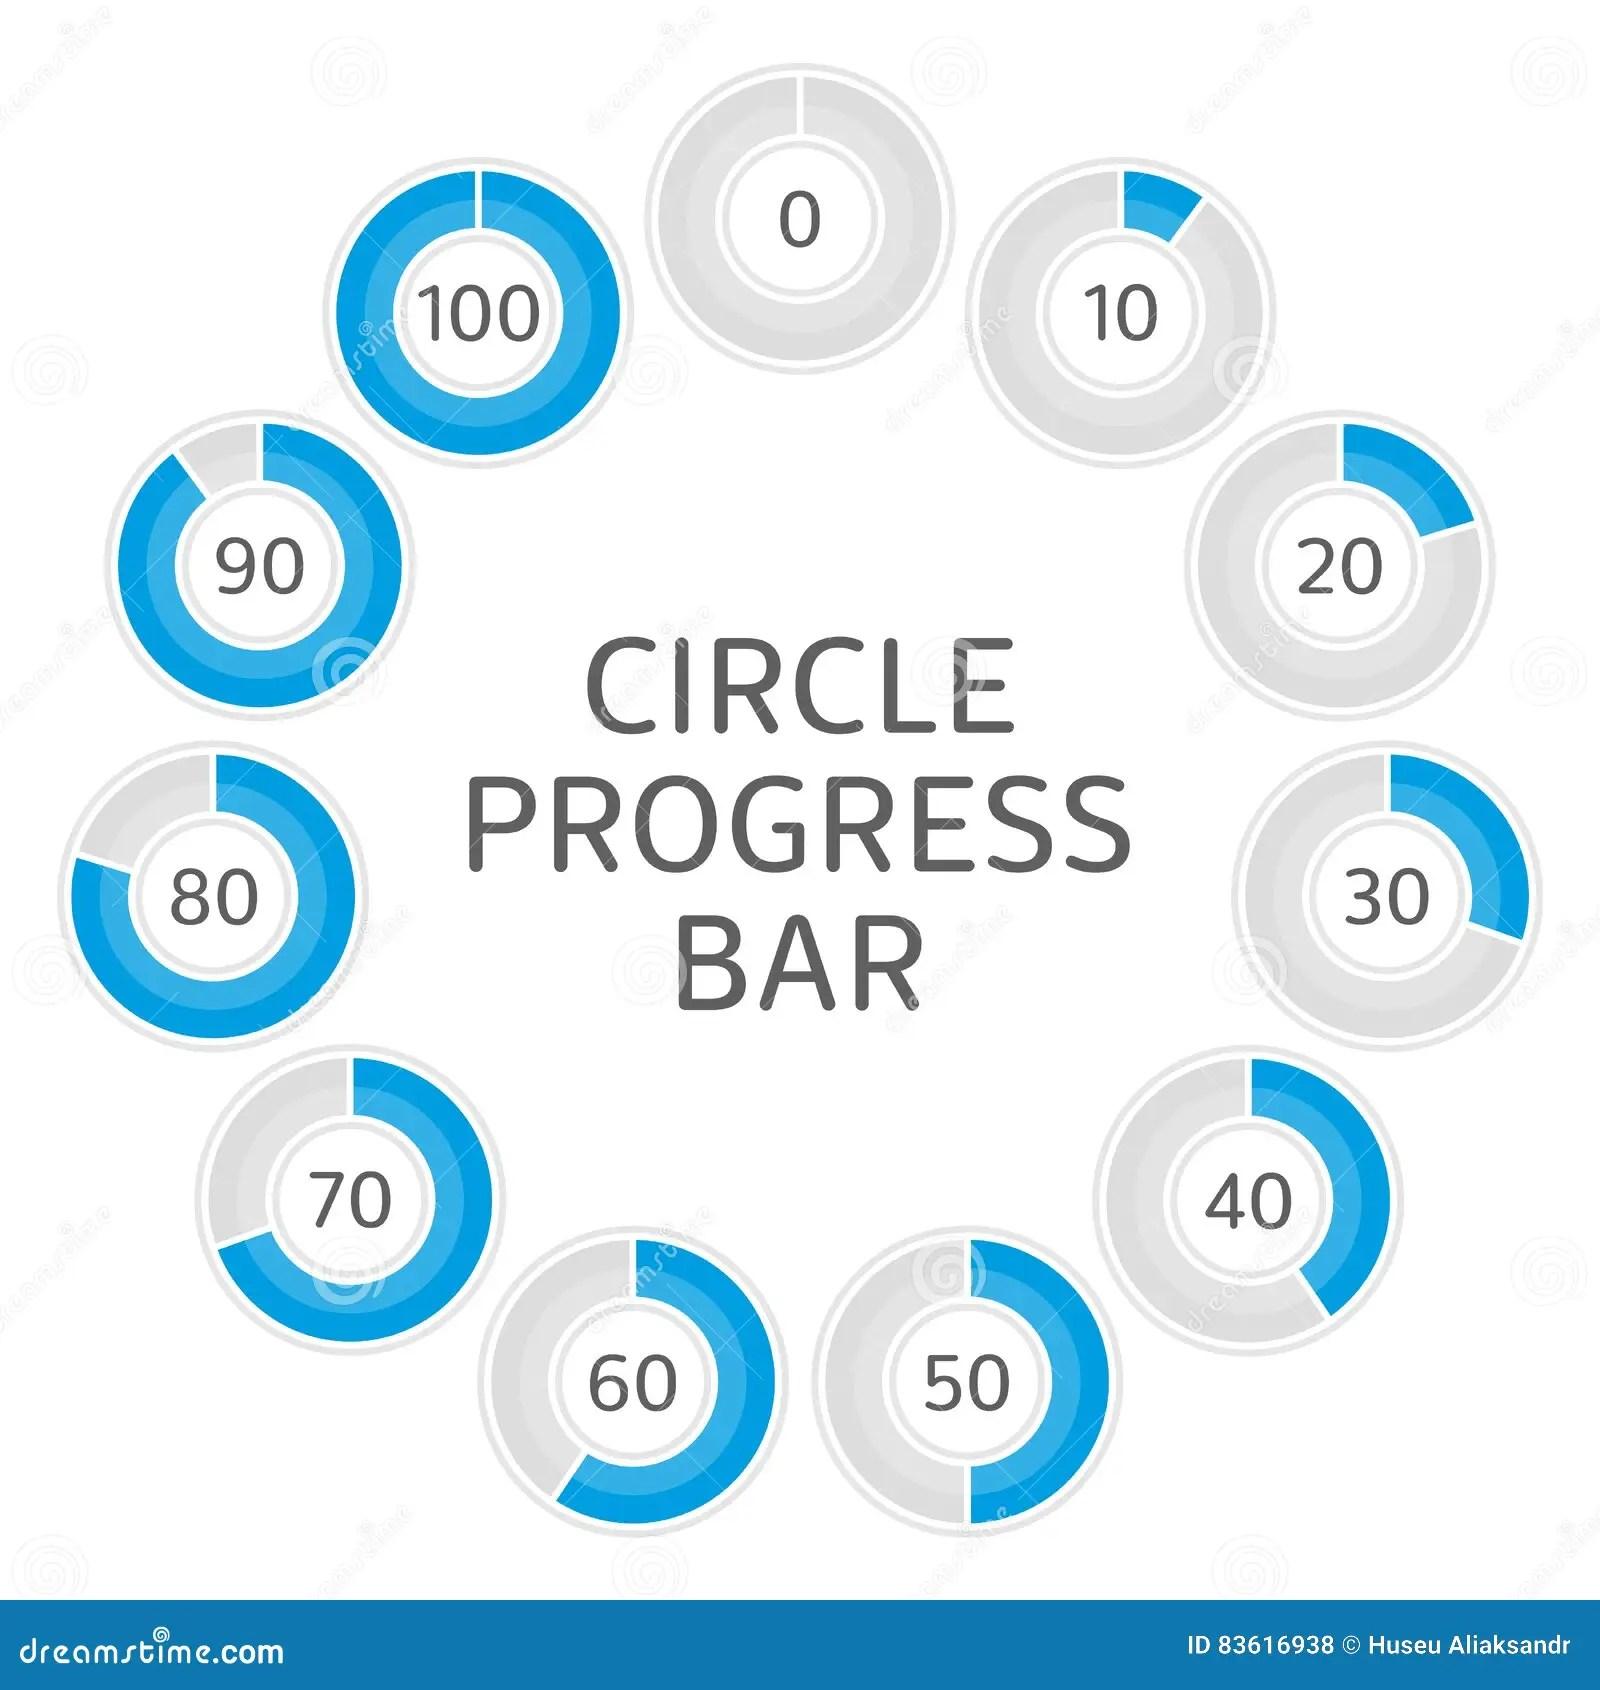 Circle Progress Bar Stock Vector Illustration Of Design